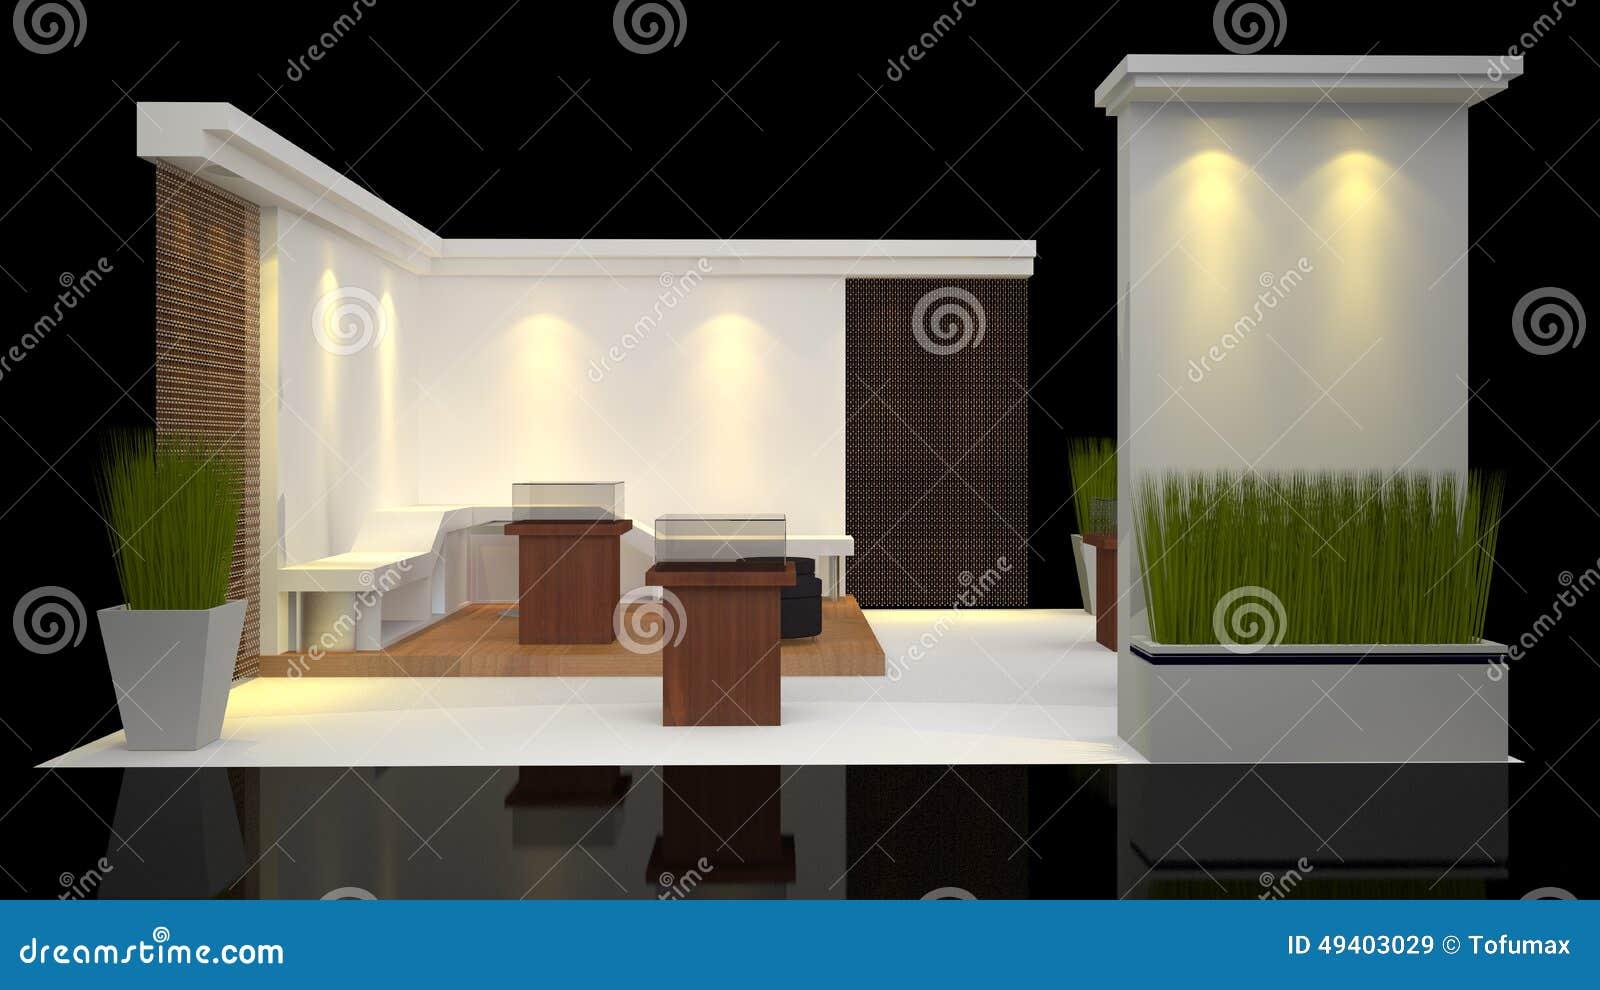 Download Standausstellung stock abbildung. Illustration von fall - 49403029